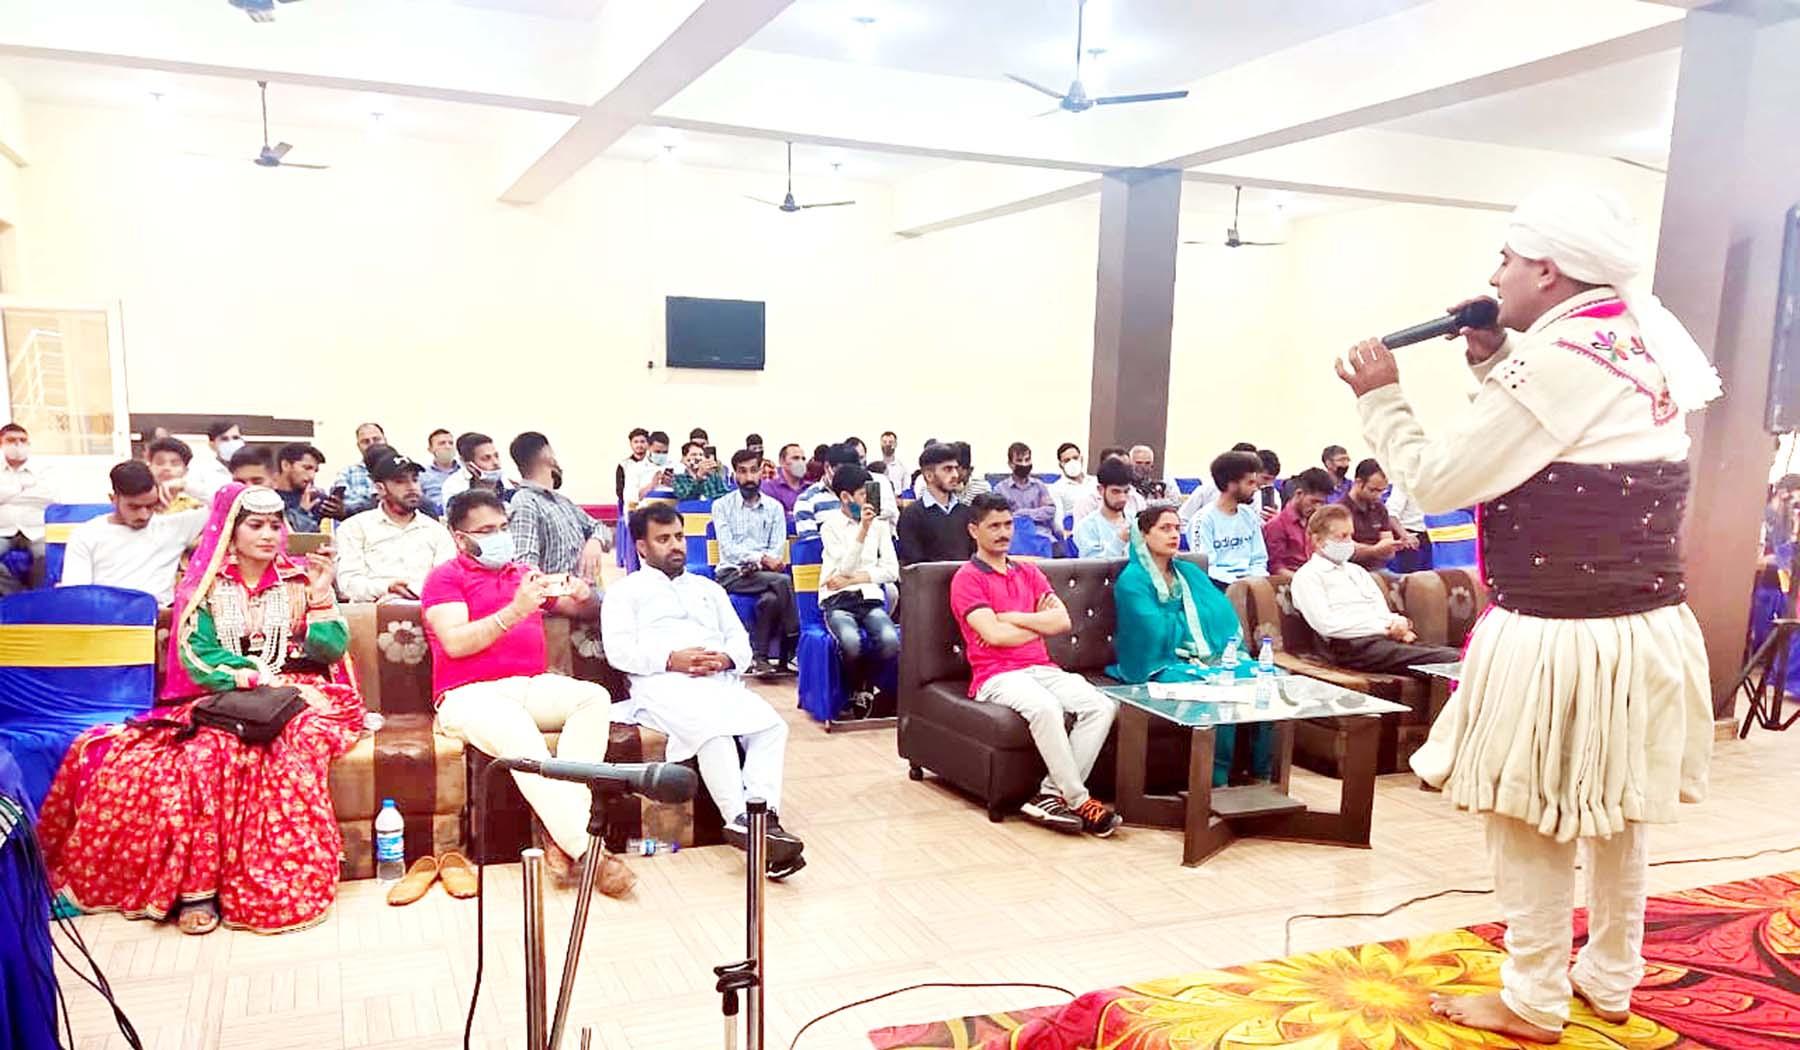 Members of Gaddi community during a programme to celebrate foundation day of Gaddi Sabha.